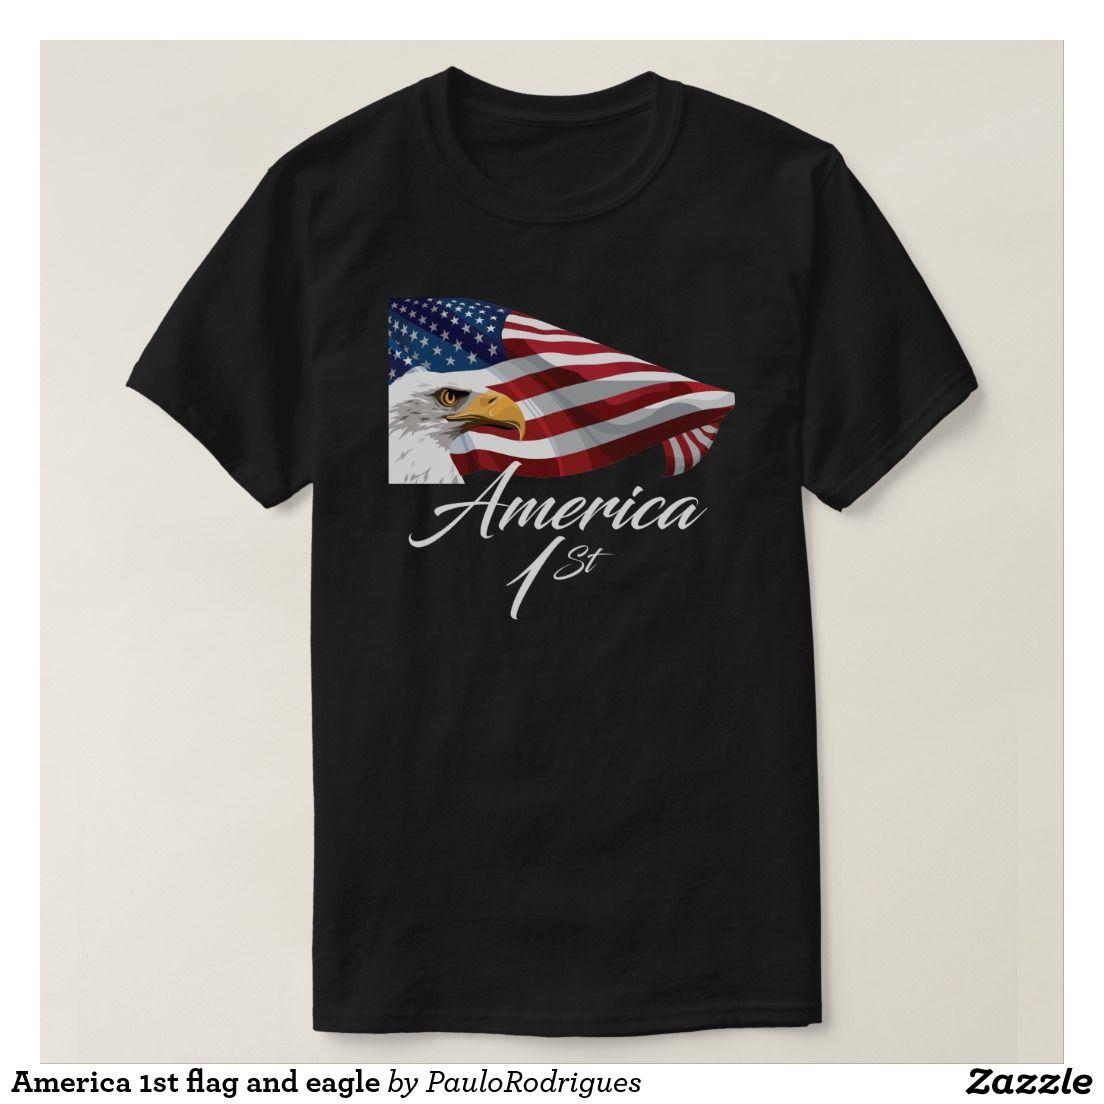 America 1st flag and eagle T-Shirt